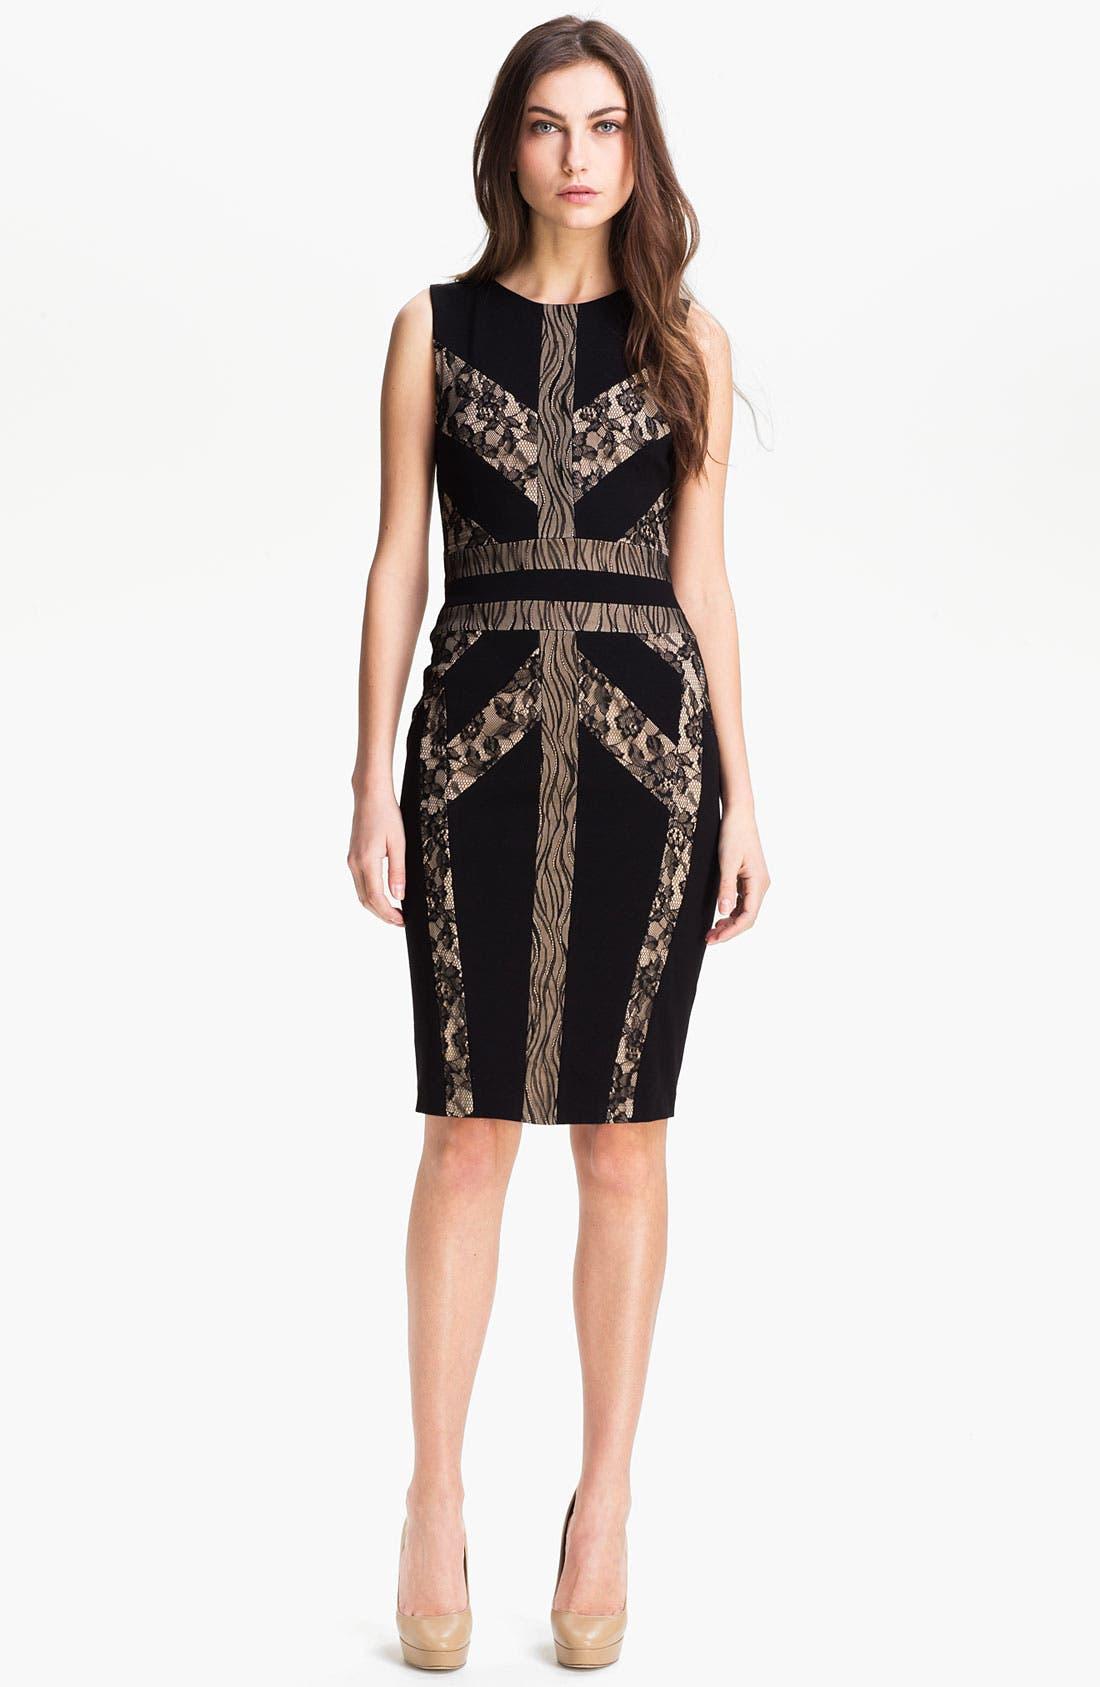 Alternate Image 1 Selected - BCBGMAXAZRIA 'Raina' Techno Knit Sheath Dress